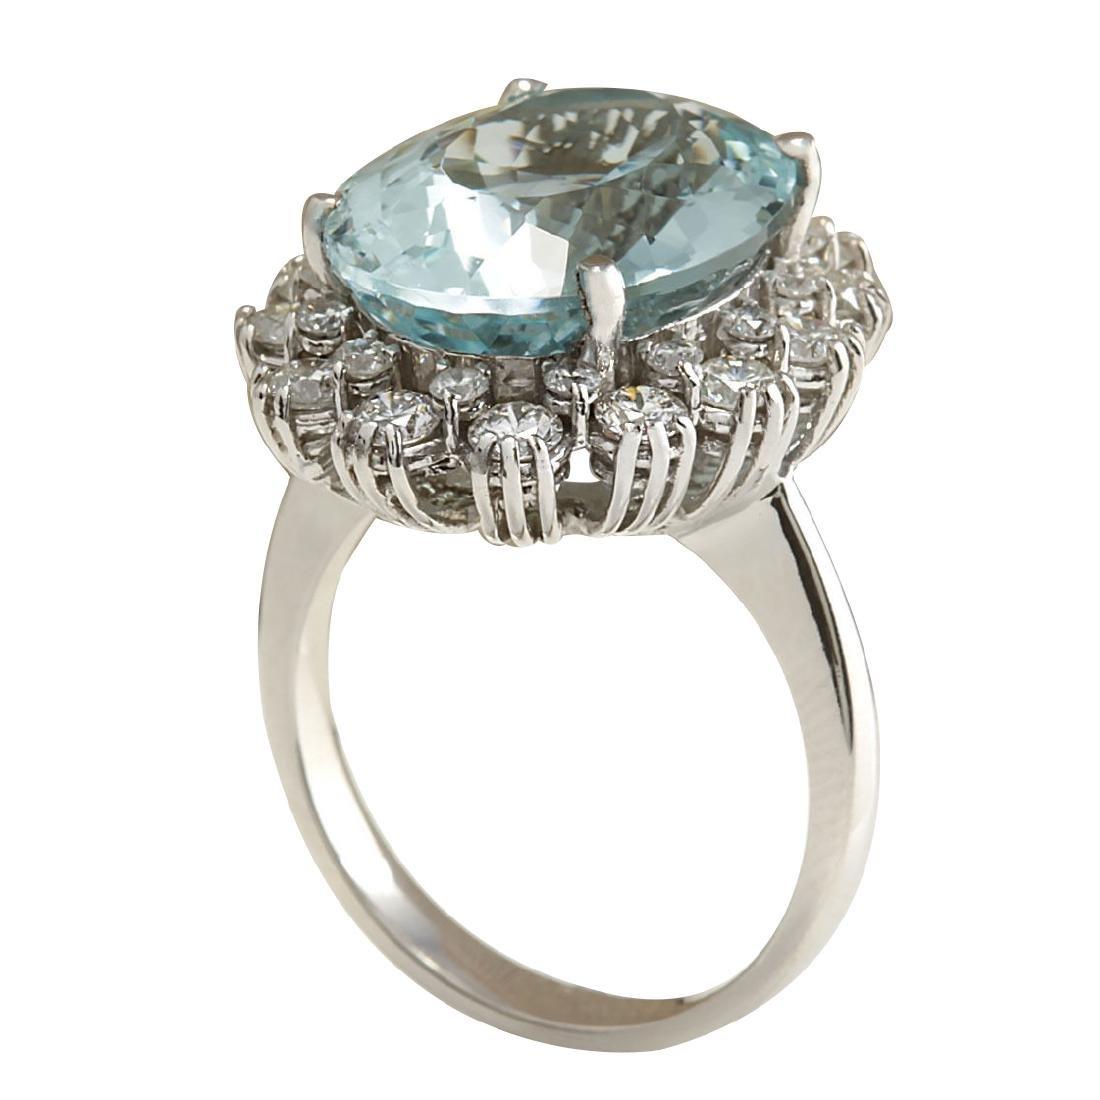 10.25CTW Natural Aquamarine And Diamond Ring In 18K - 3